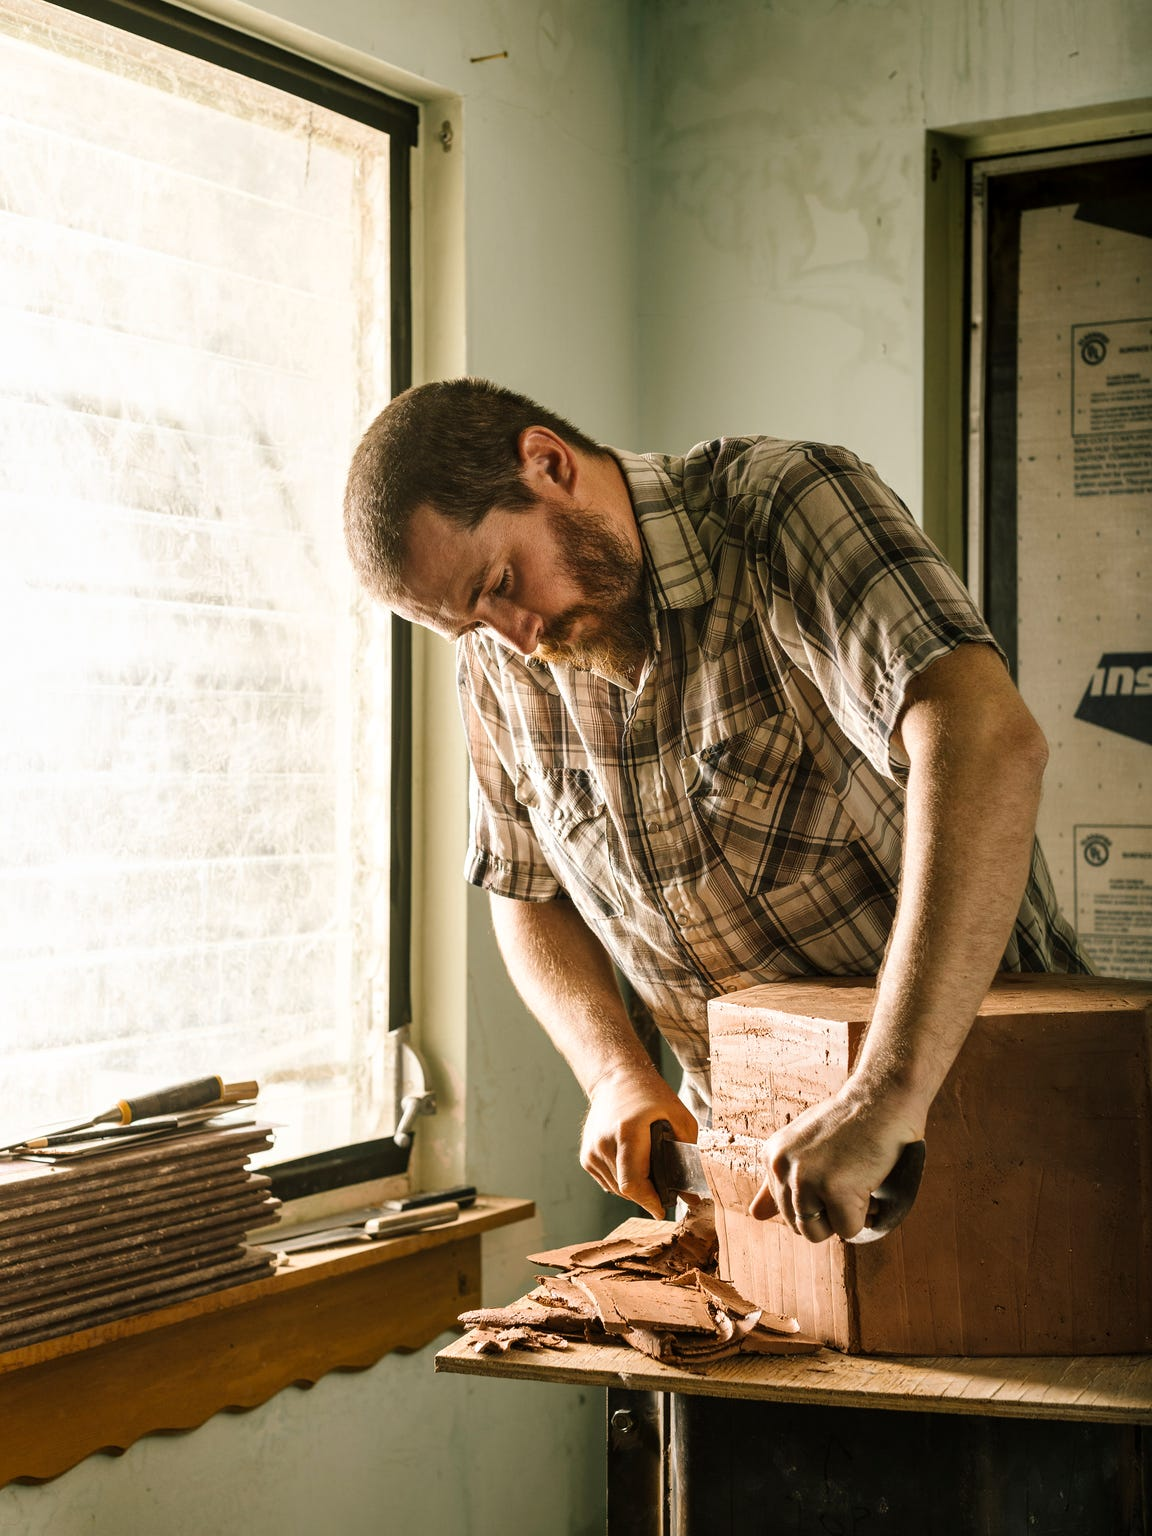 Jonathan Cross at work in his studio in Twentynine